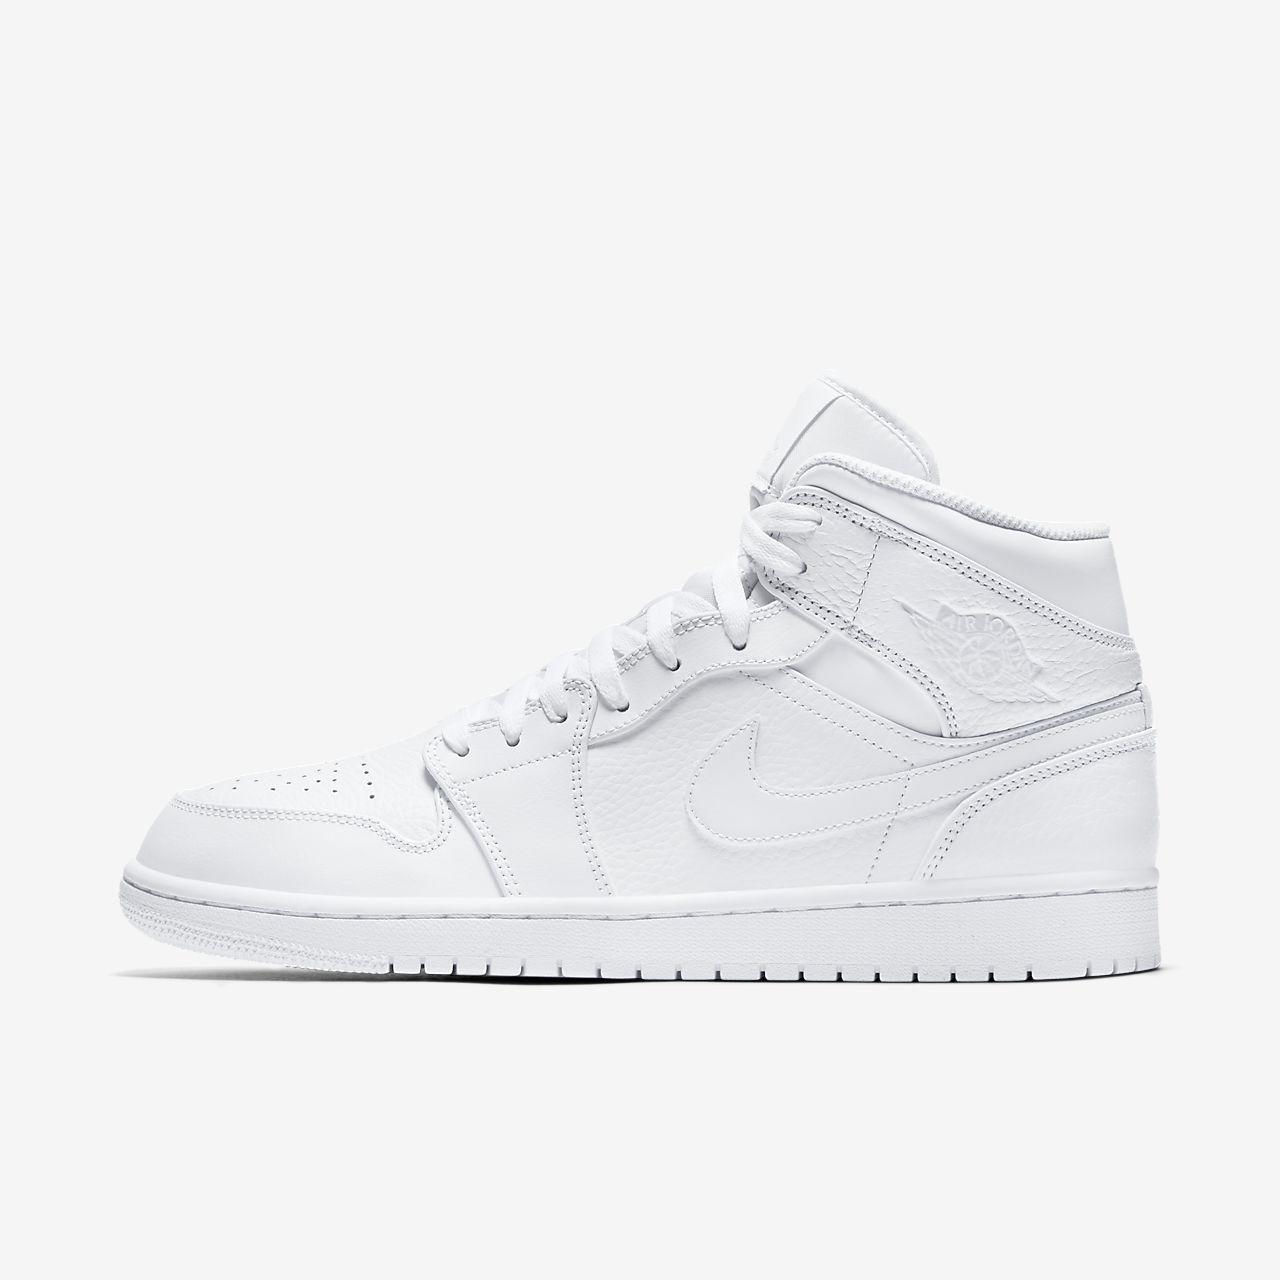 Air Jordan 1 Mid 男子运动鞋耐克官网中国 643e6cc8b